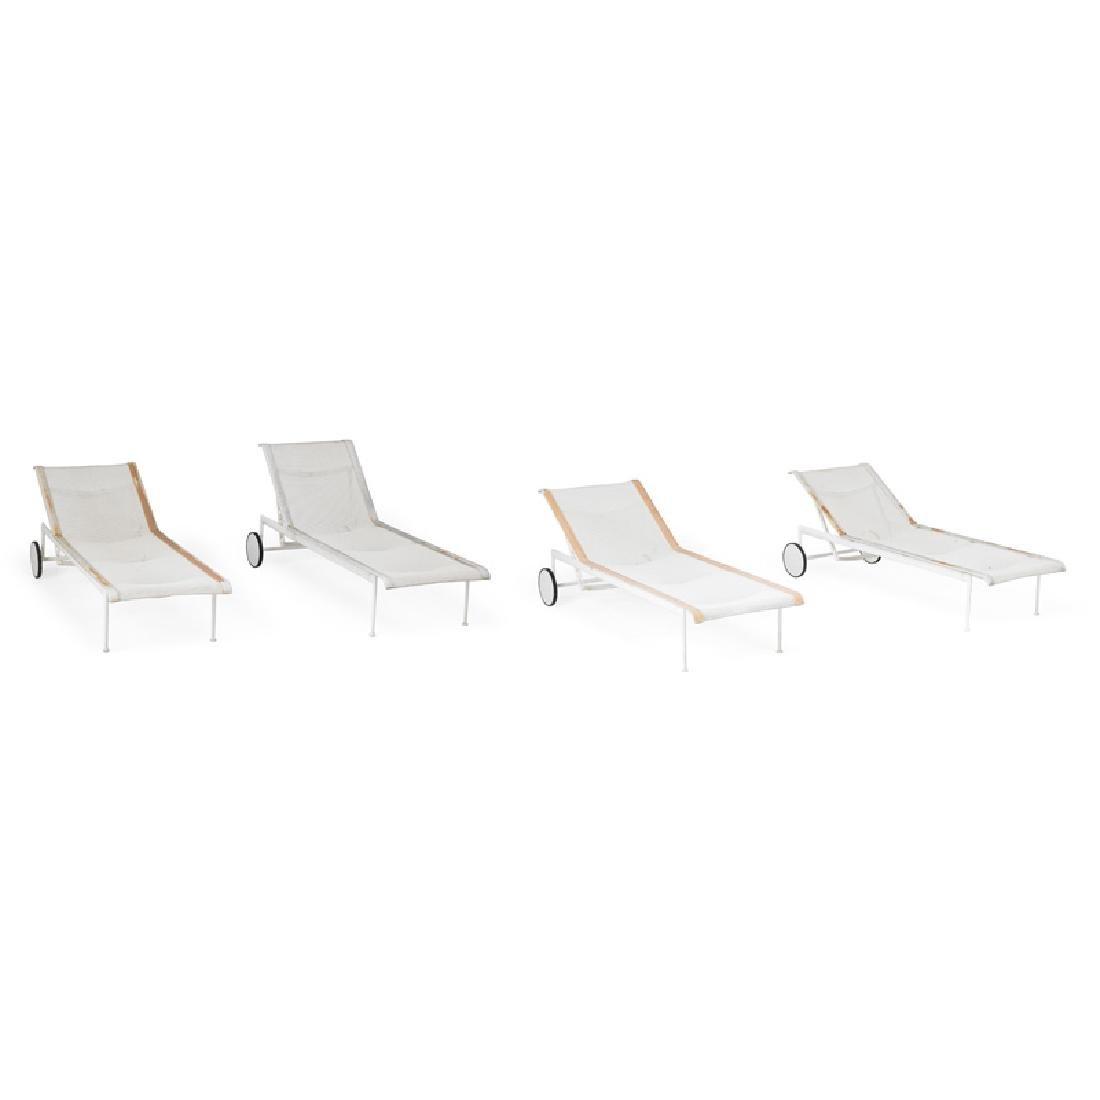 RICHARD SCHULTZ Four reclining lounge chairs